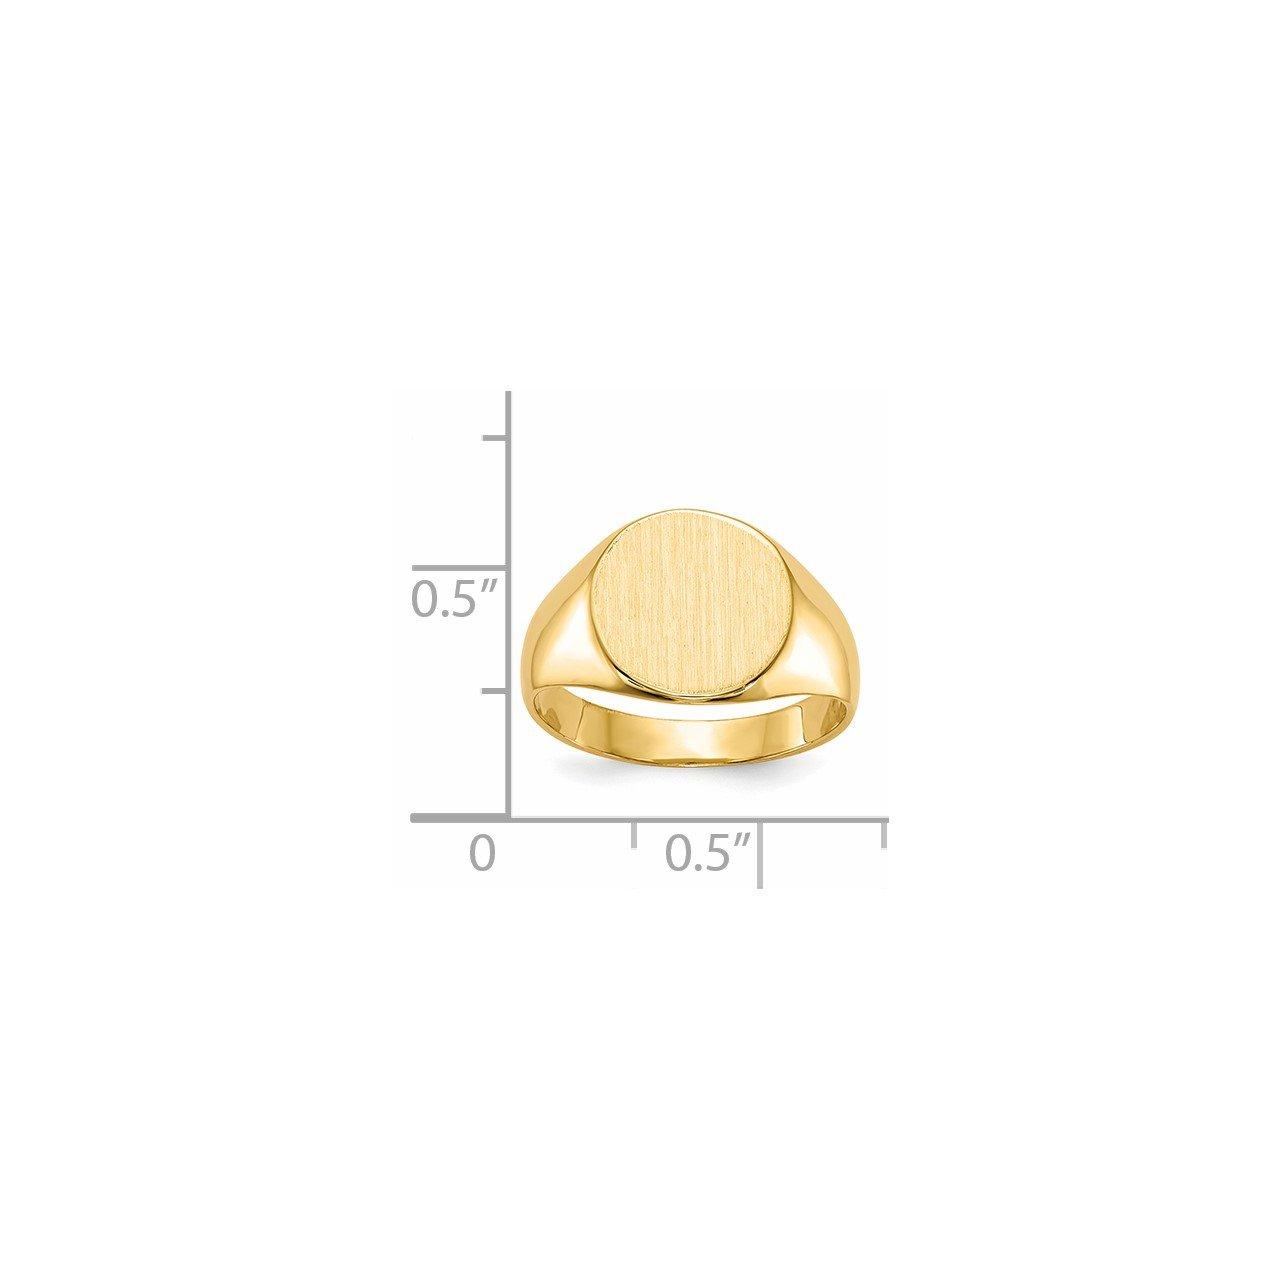 14k 10.5x11.0mm Closed Back Signet Ring-4